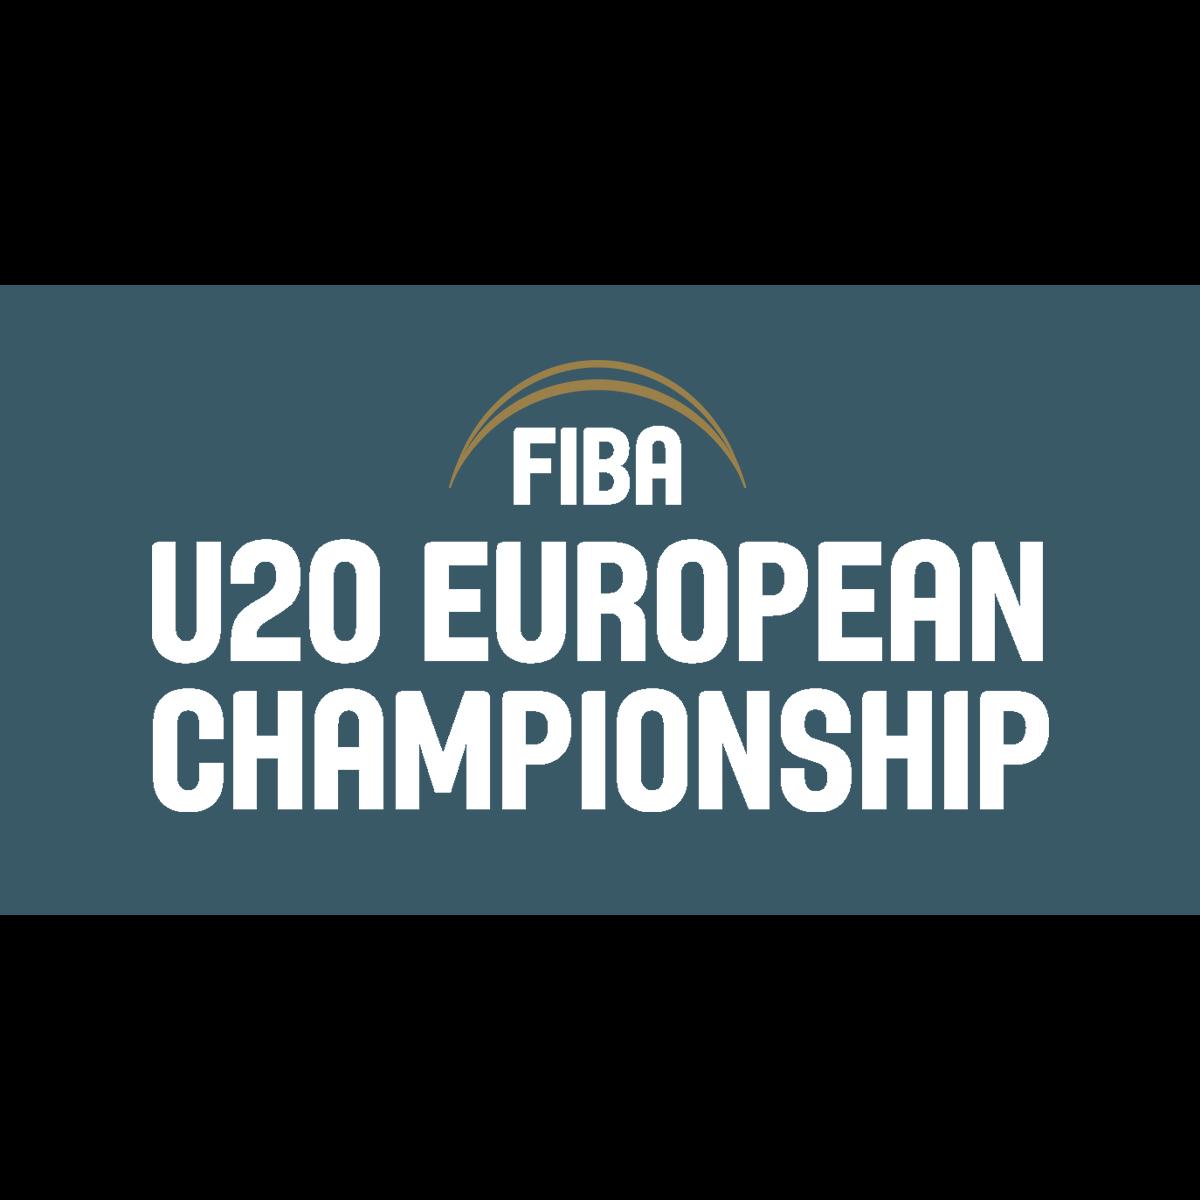 2018 FIBA U20 European Basketball Championship - Division B